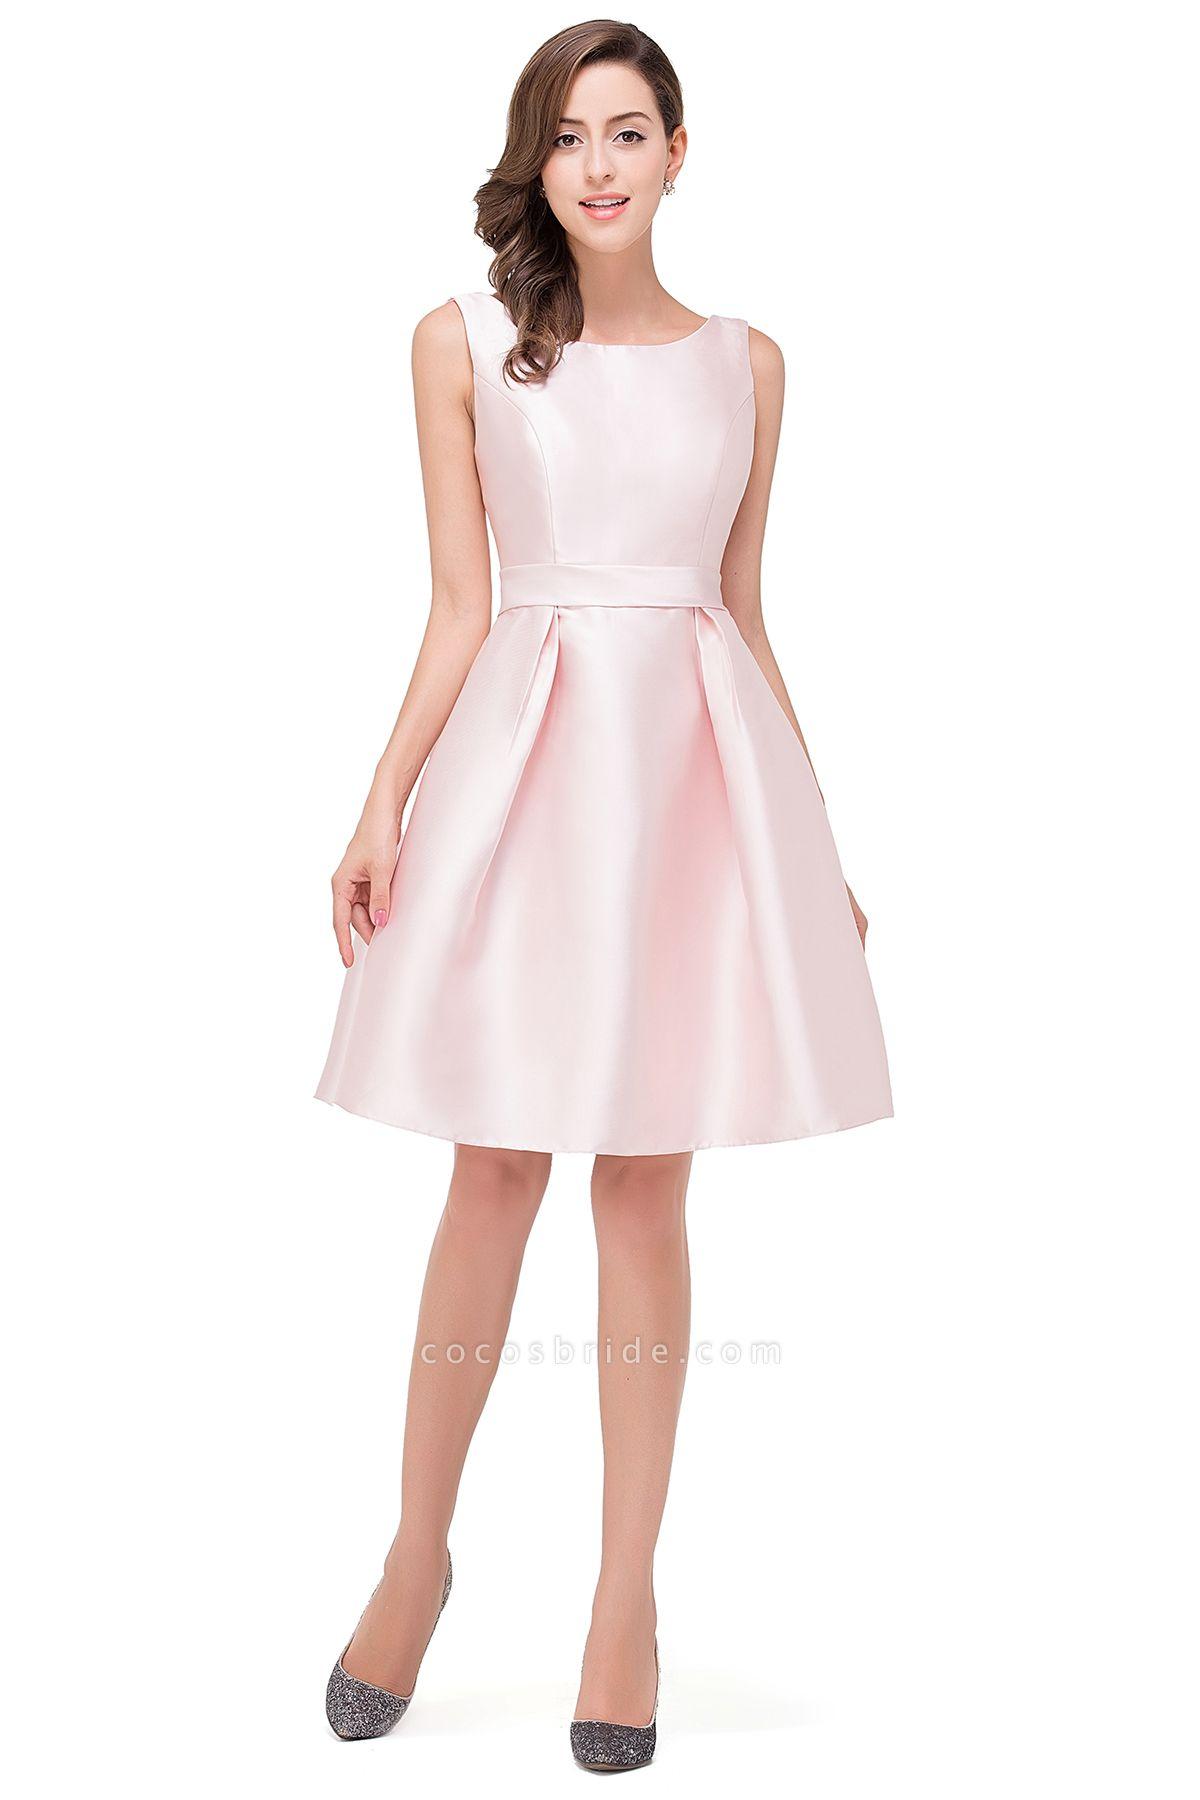 EMERSON | A-Line Sleeveless Knee Length Sleeveless Prom Dresses